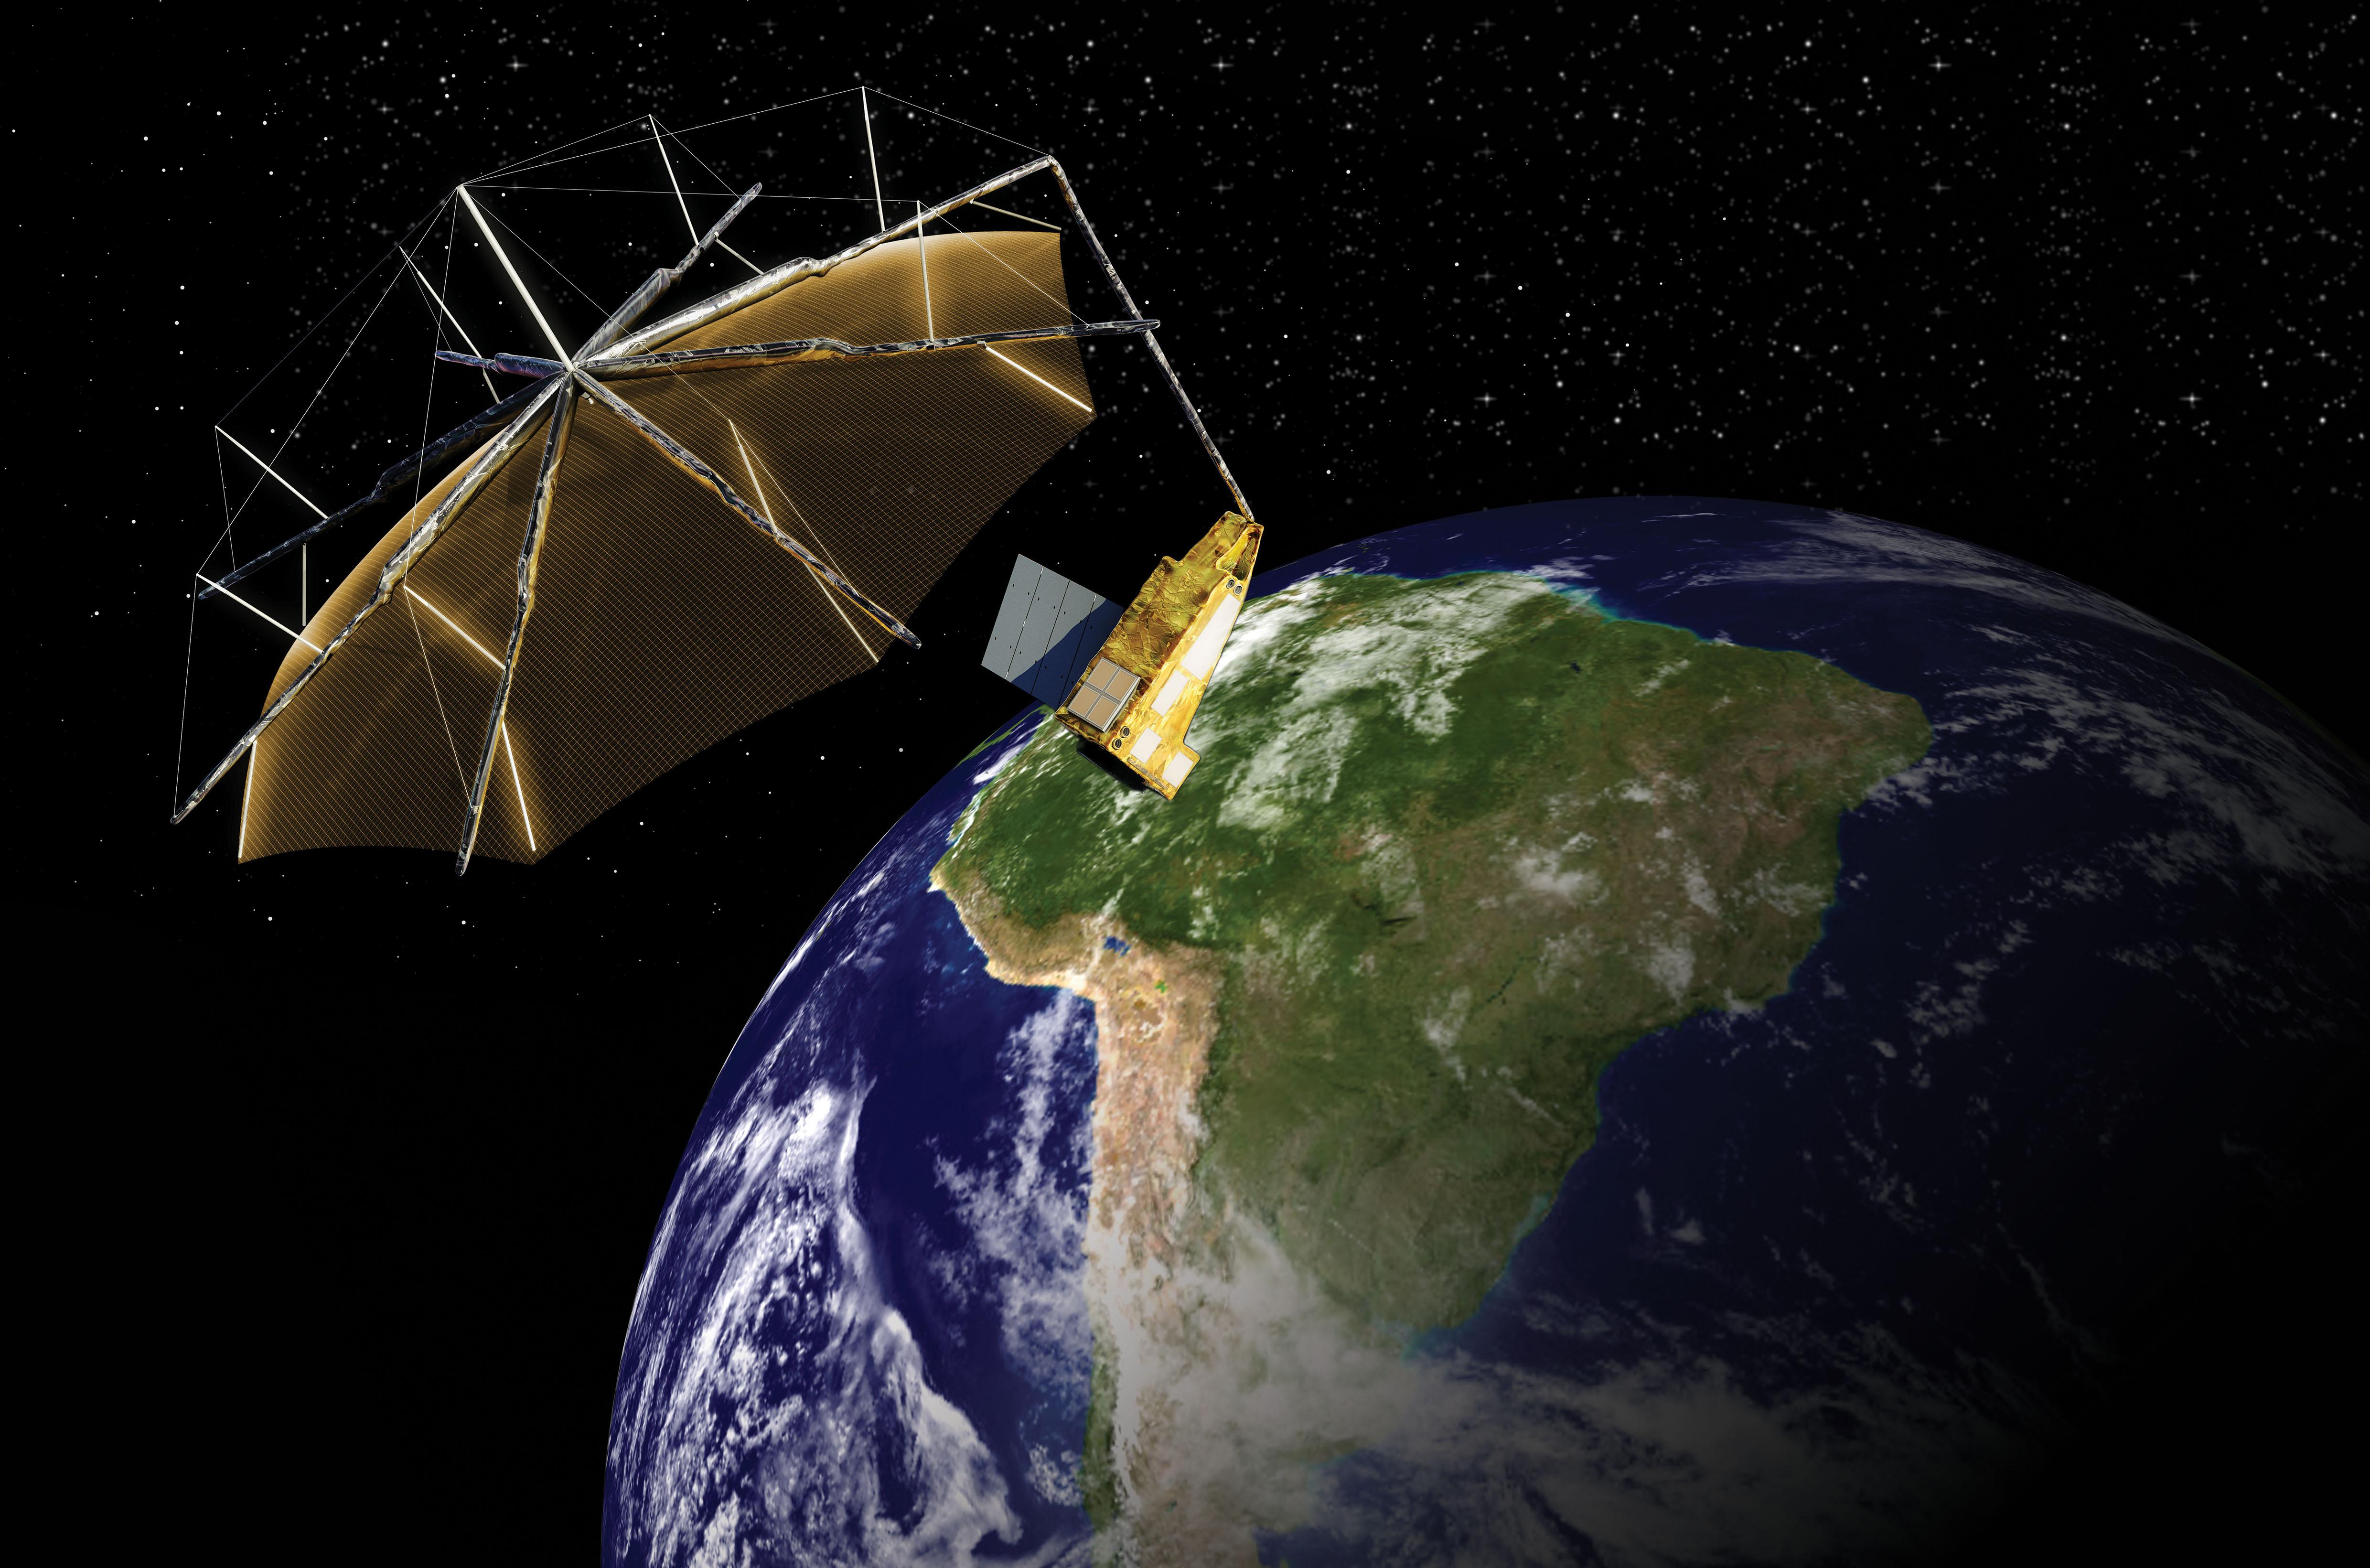 satellite and spacecraft - photo #44